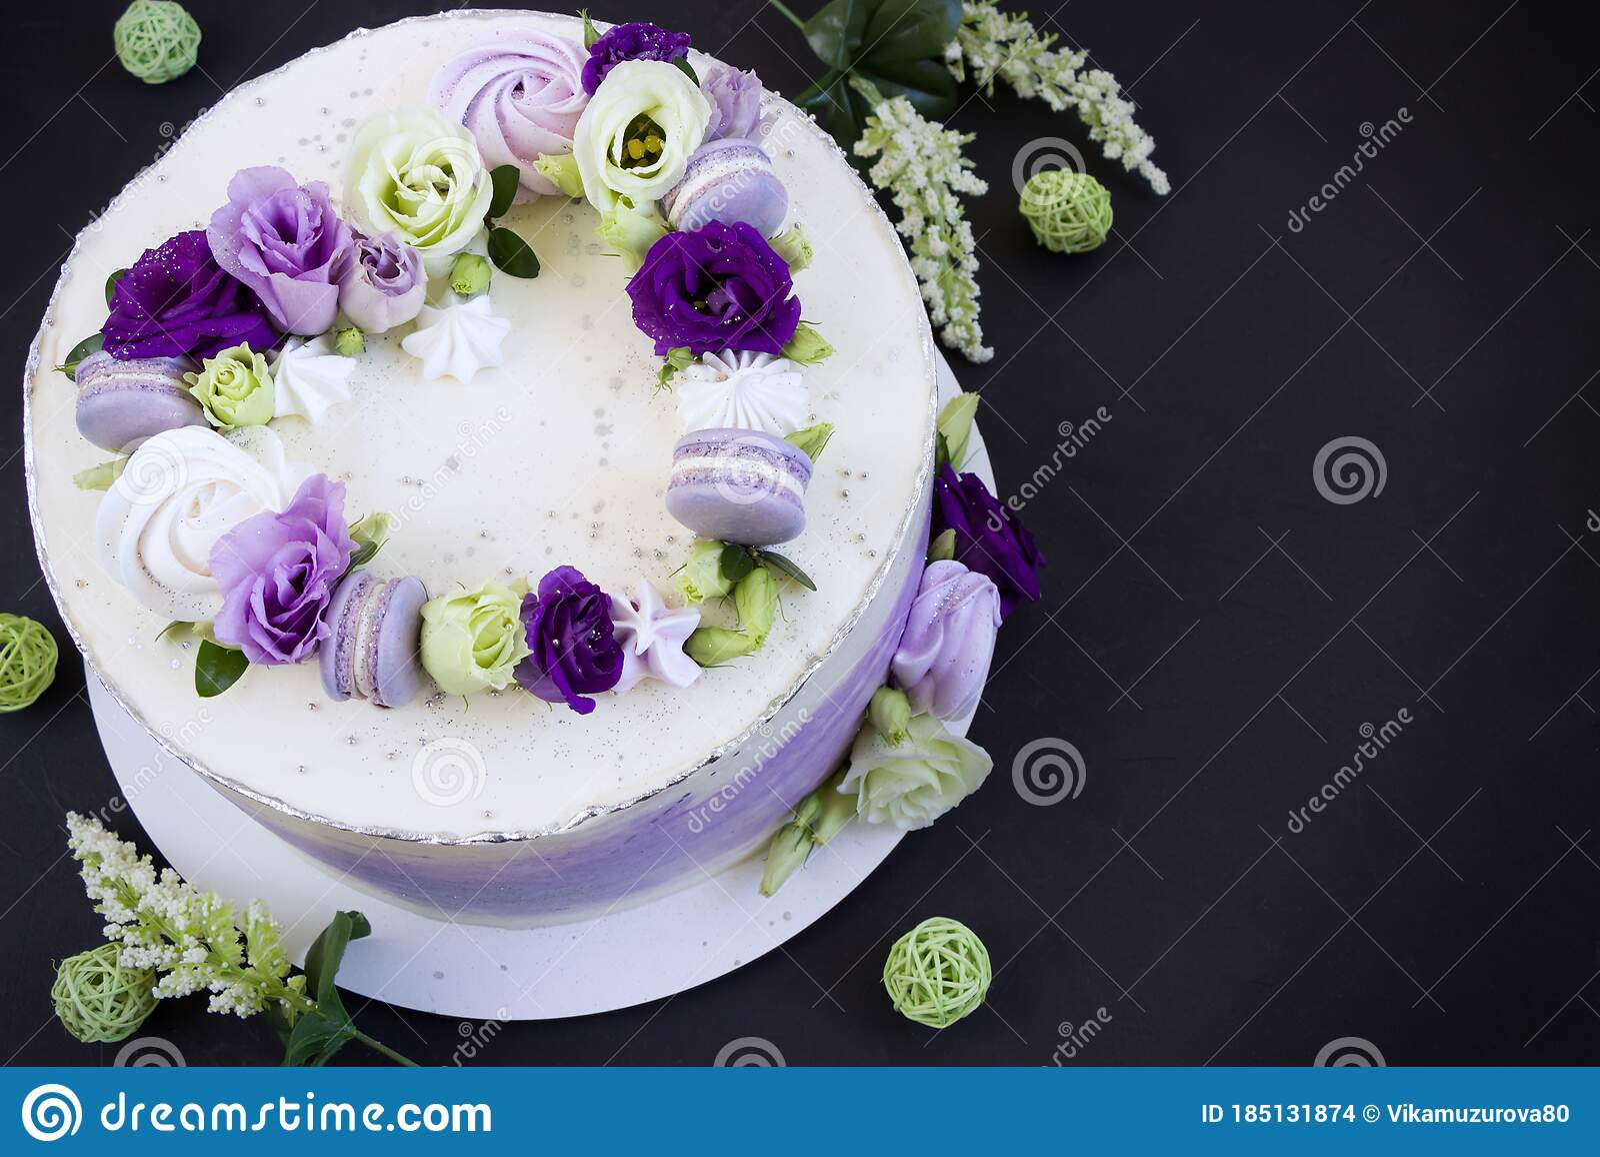 Beautiful Purple Cake Decoraited Of Fresh Flowers Macaroons And Meringue Heart Cake Love Concept Wedding Cake Birthday Cake Stock Photo Image Of Beautiful Black 185131874